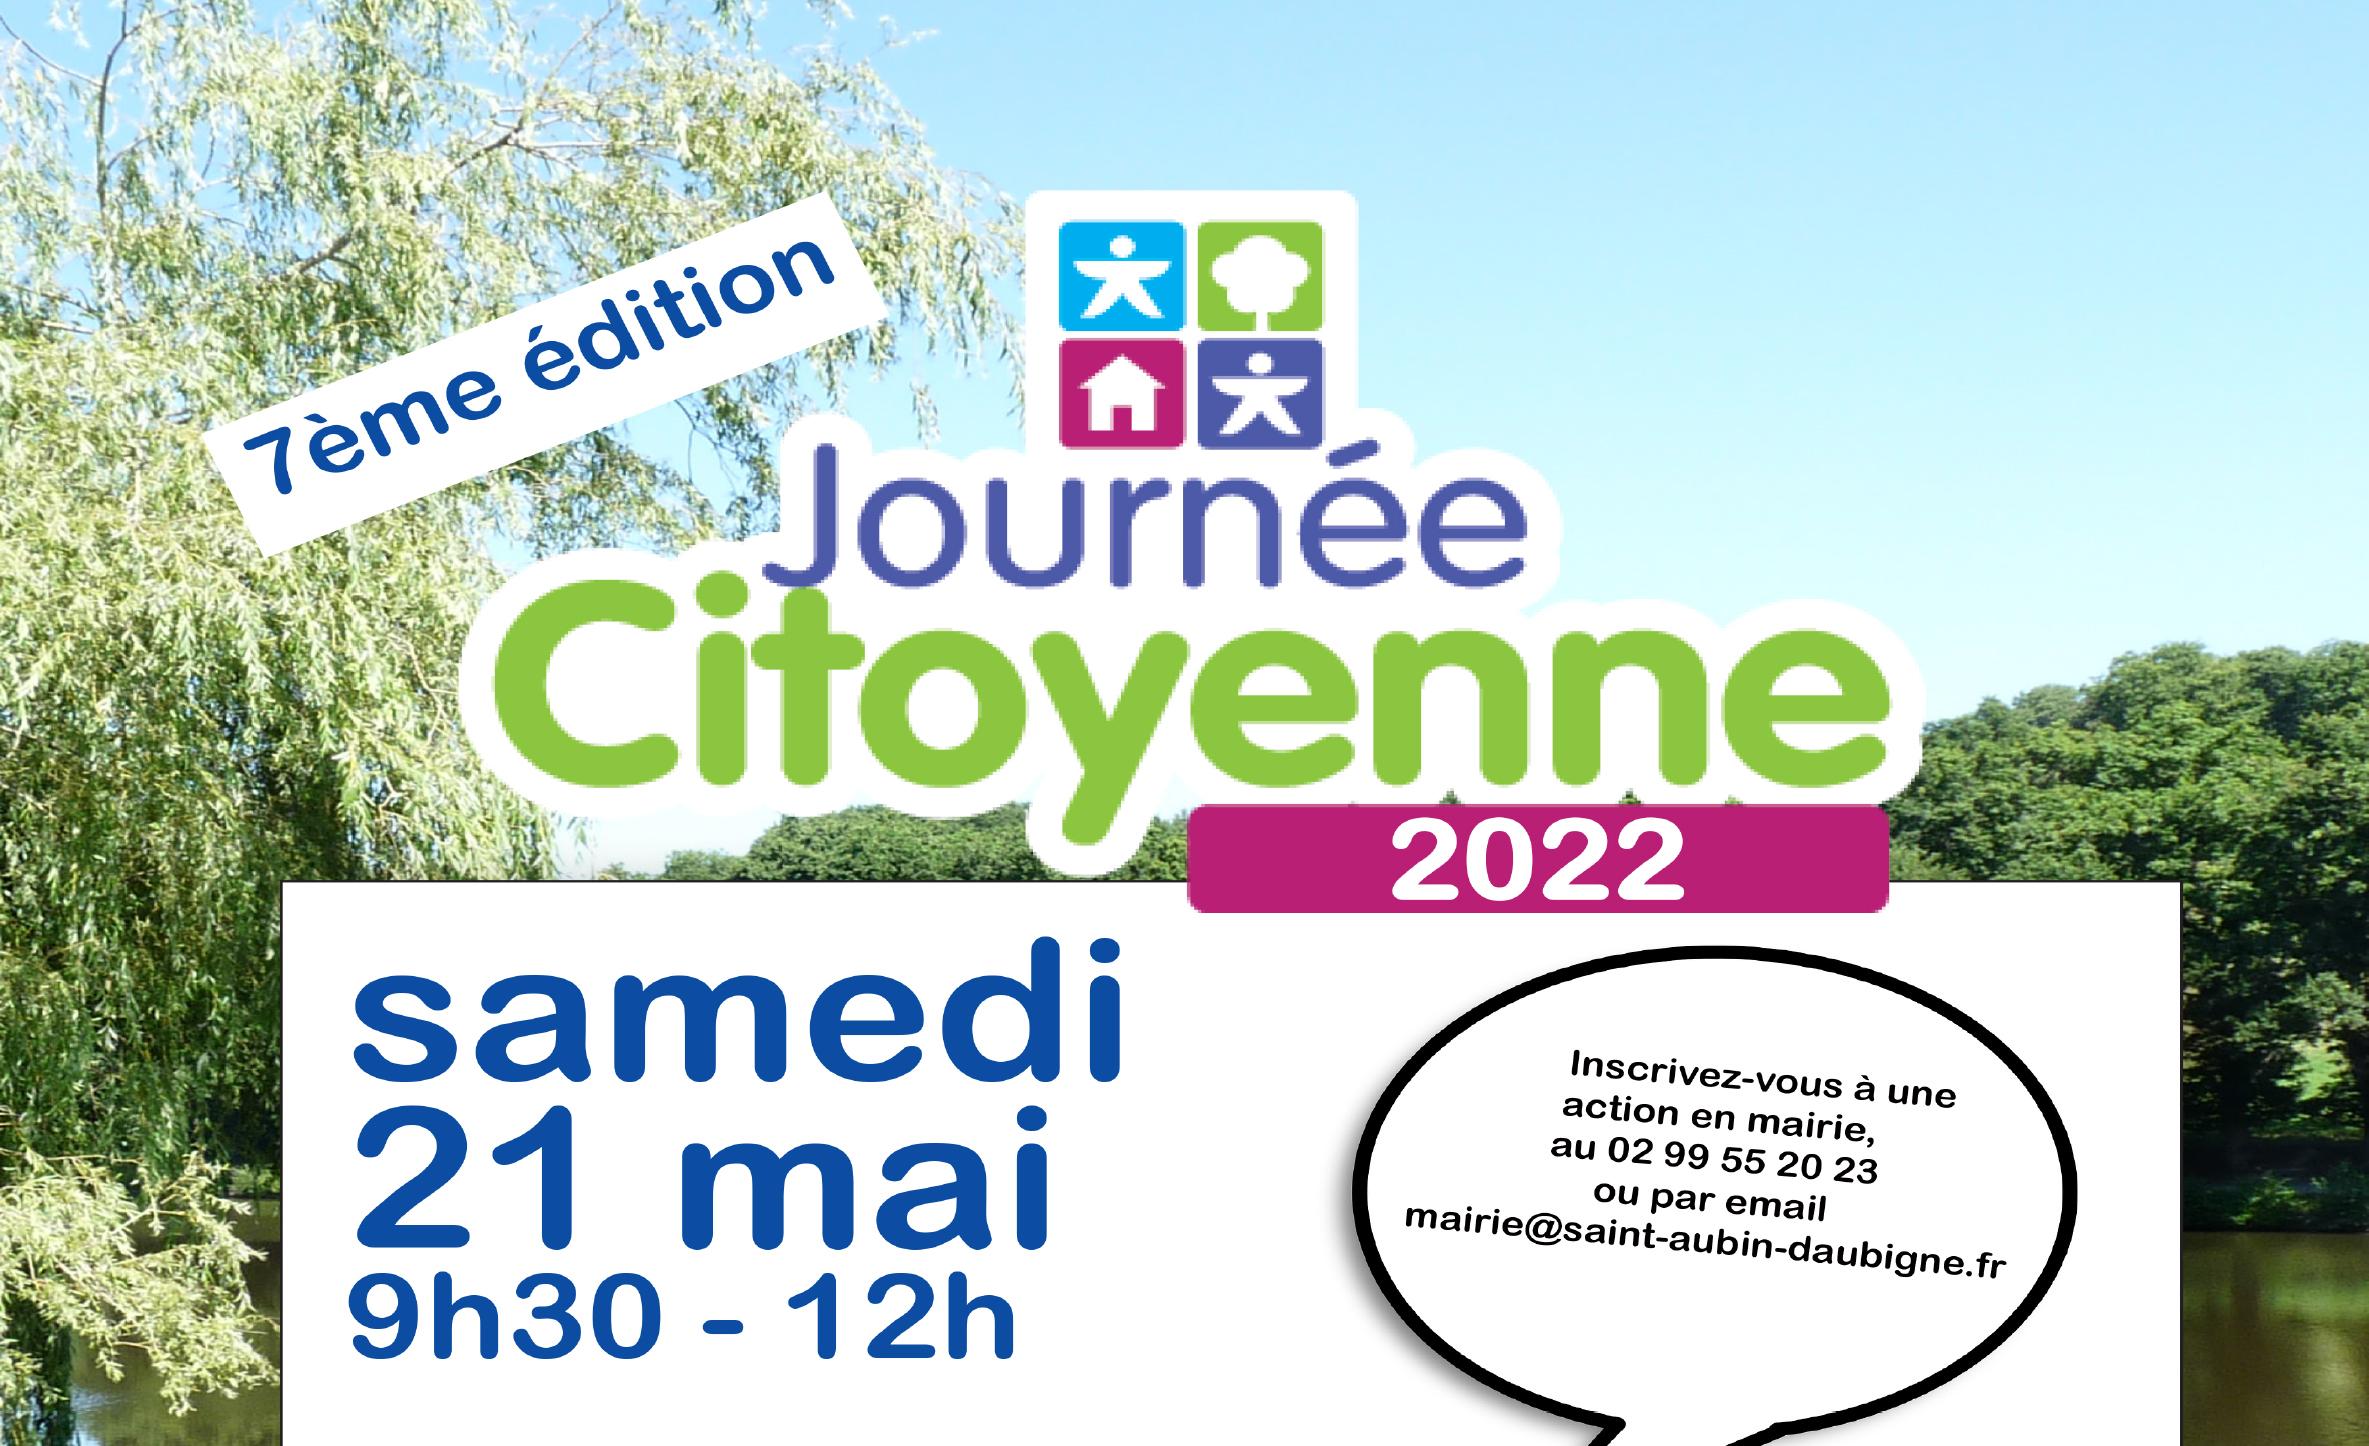 Journée citoyenne samedi 29 mai 2021